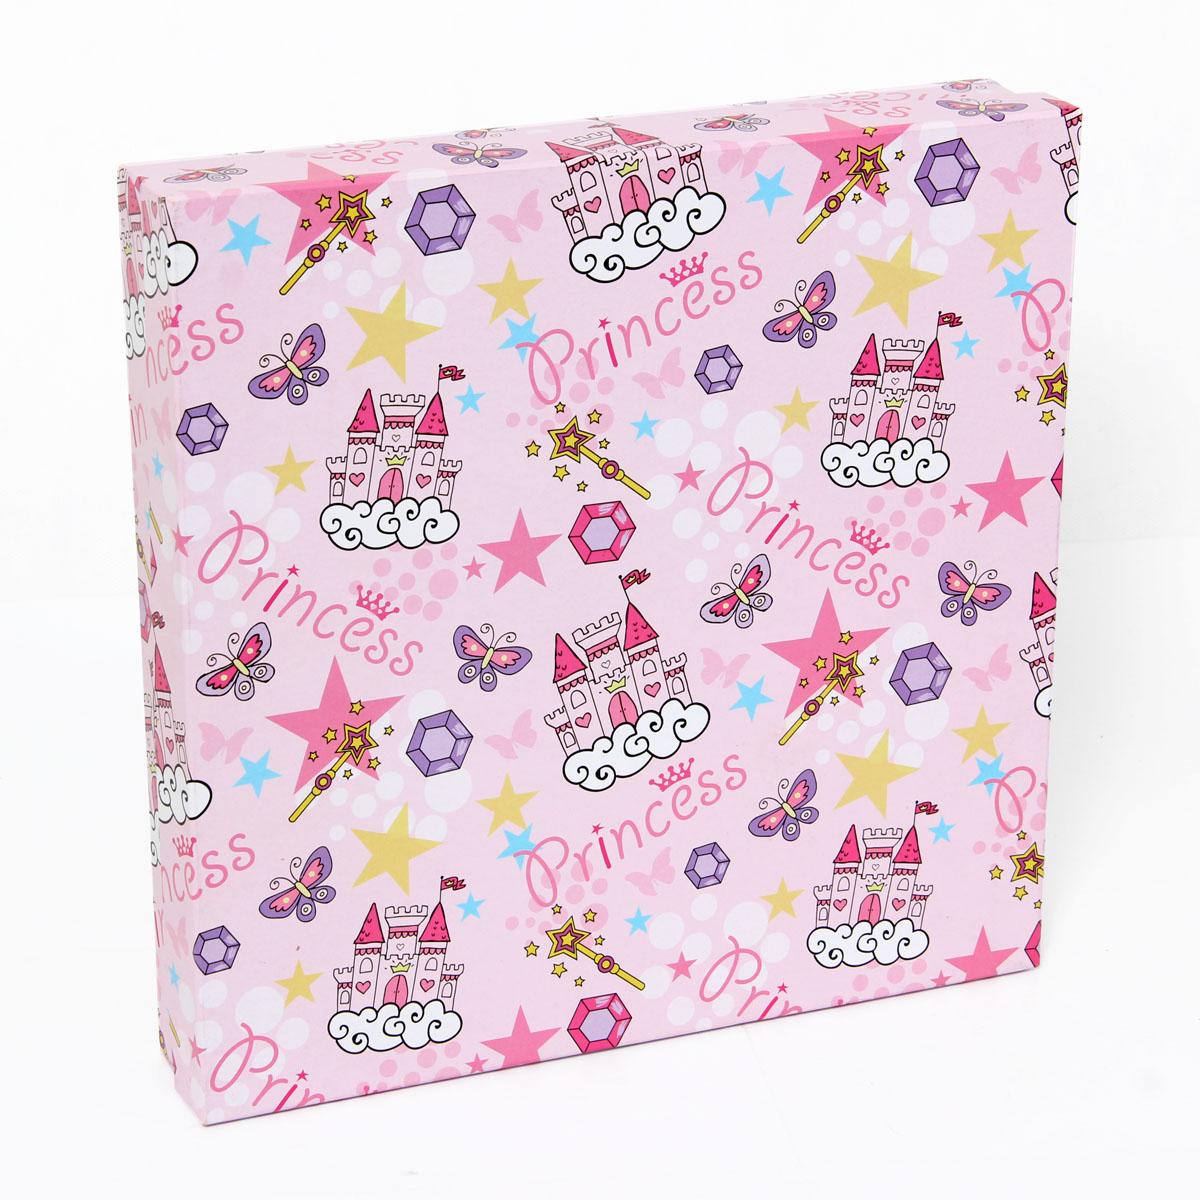 Набор подарочных коробок Veld-Co Замок принцессы, 4 шт набор подарочных коробок veld co небесные музыканты круглые 4 шт